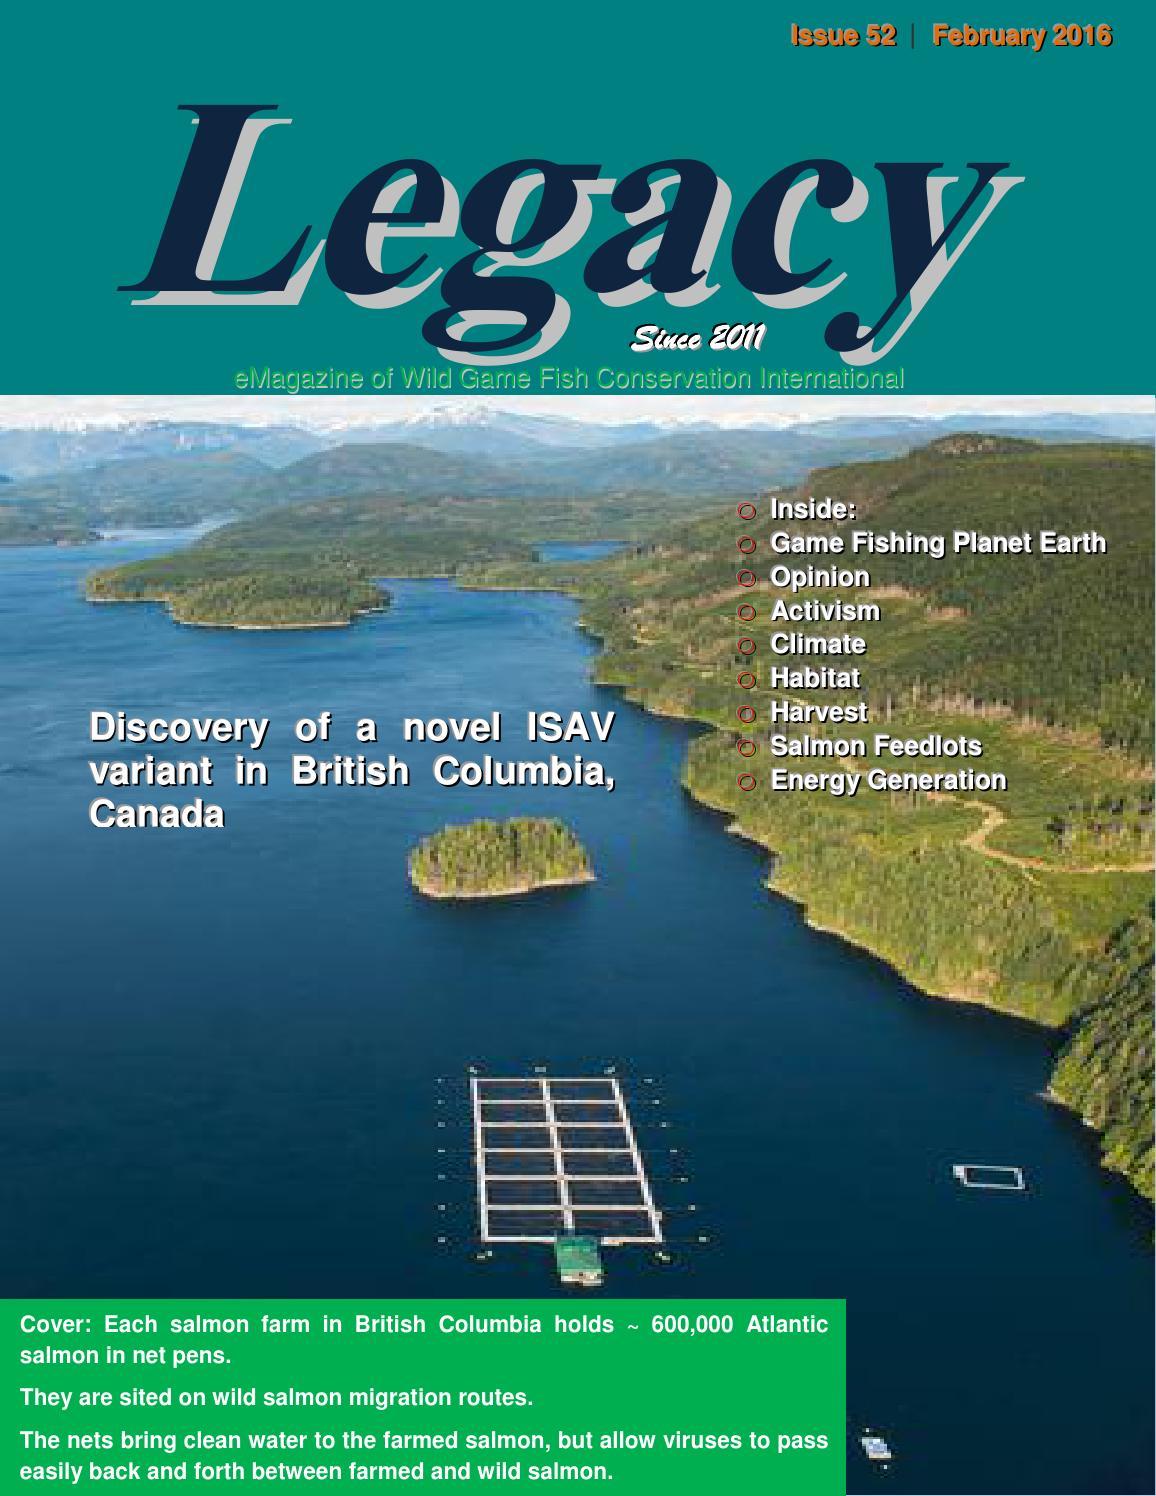 Legacy - February 2016 by Jim Wilcox - issuu